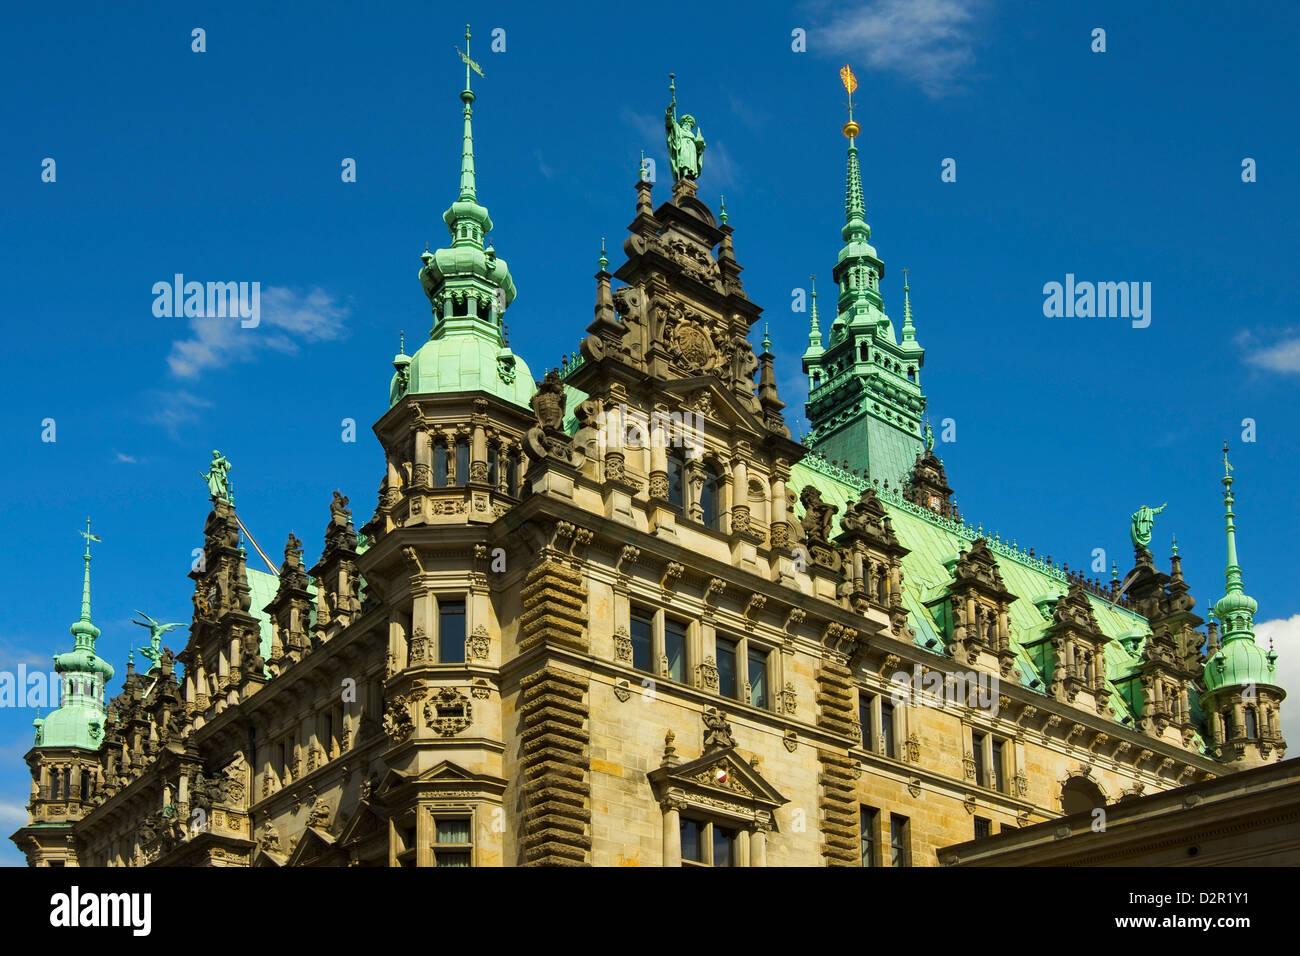 Ornate neo-renaissance architecture of the Hamburg Rathaus (City Hall), opened 1886, Hamburg, Germany, Europe - Stock Image